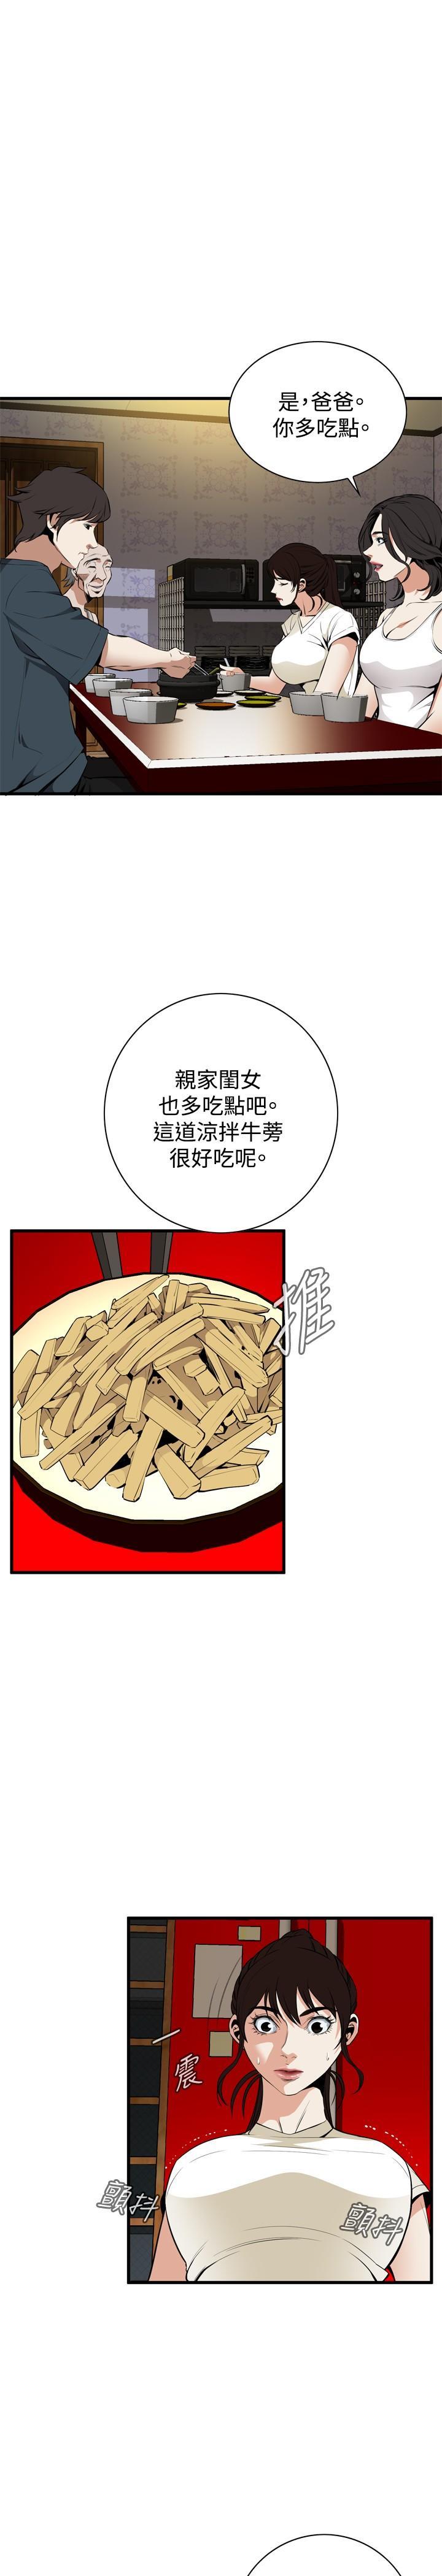 Take a Peek 偷窥 Ch.39~55 [Chinese]中文 138